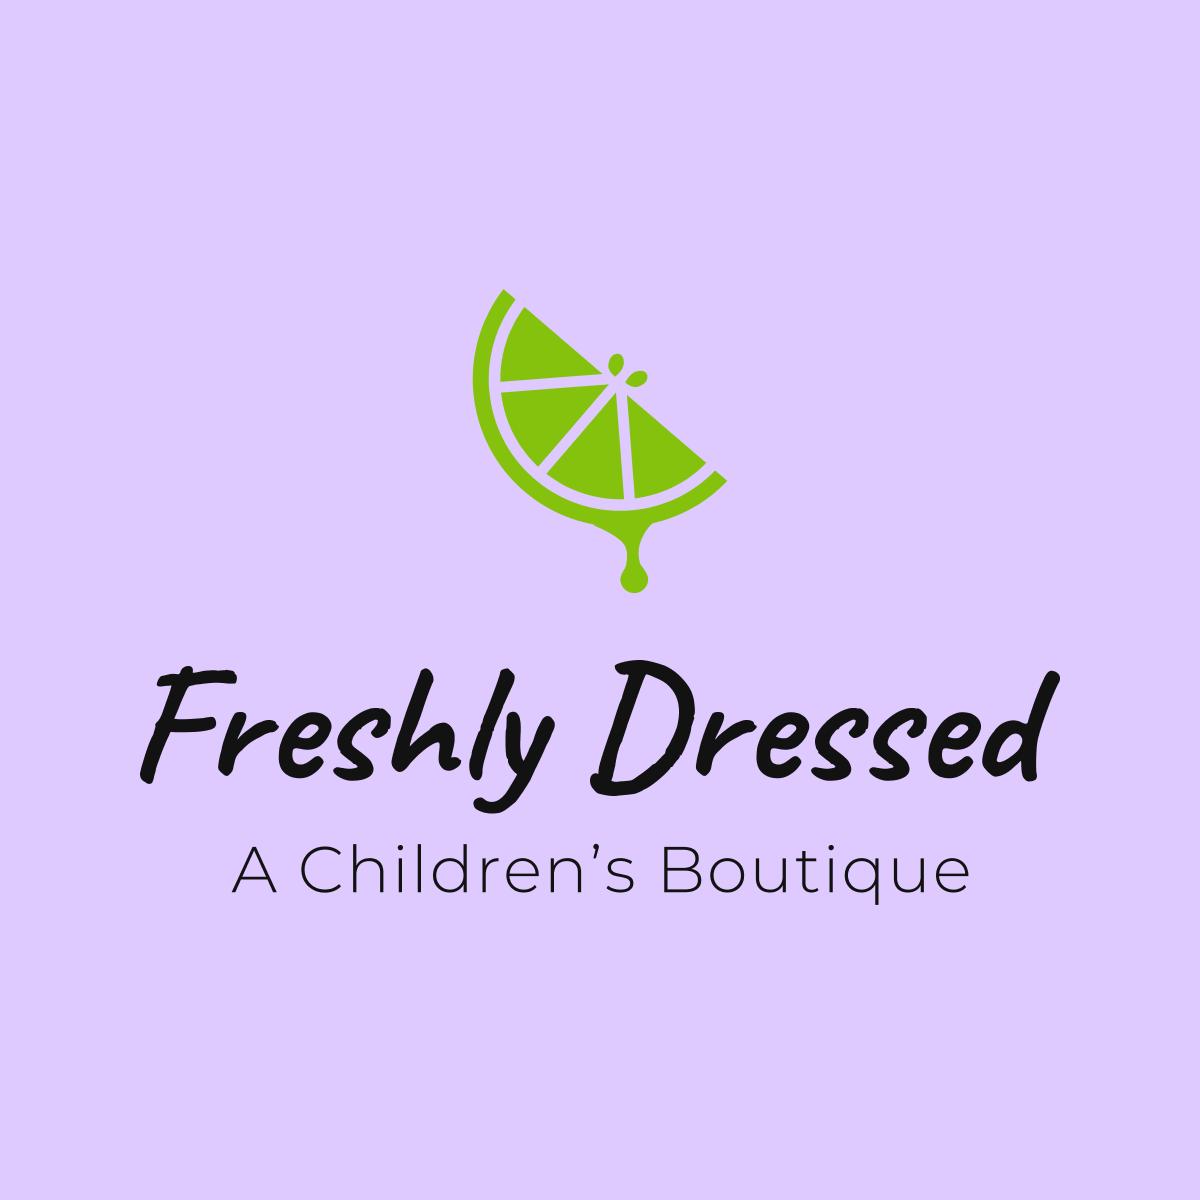 Freshly Dressed Boutique